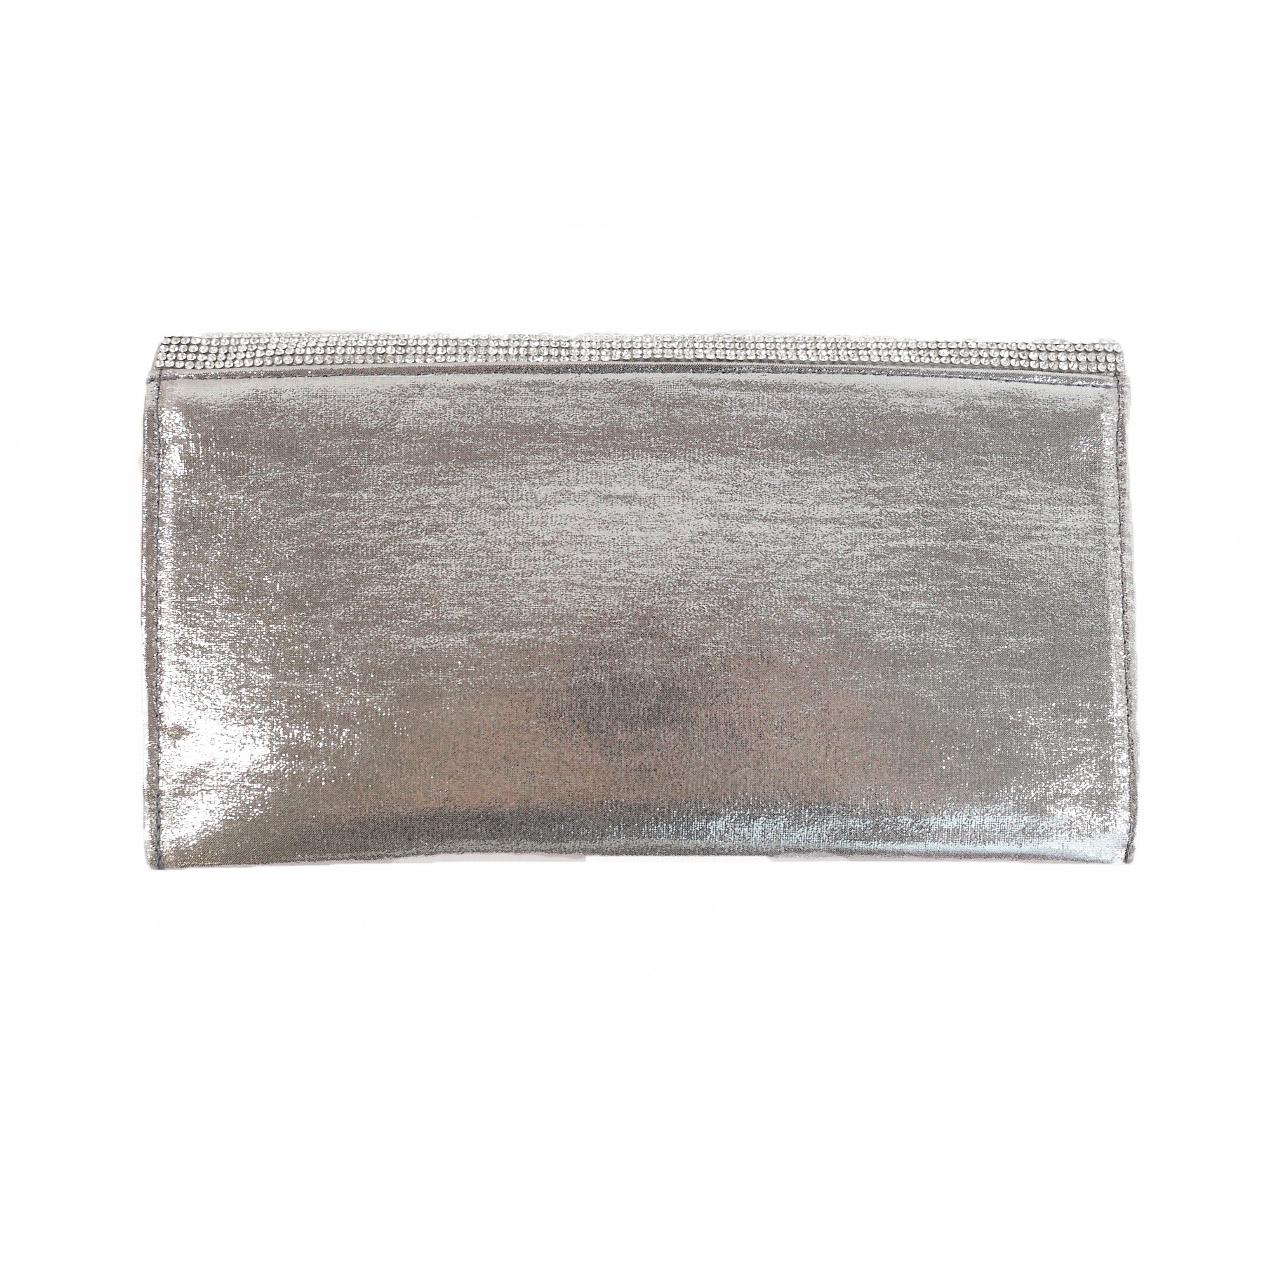 silver_clutch_back